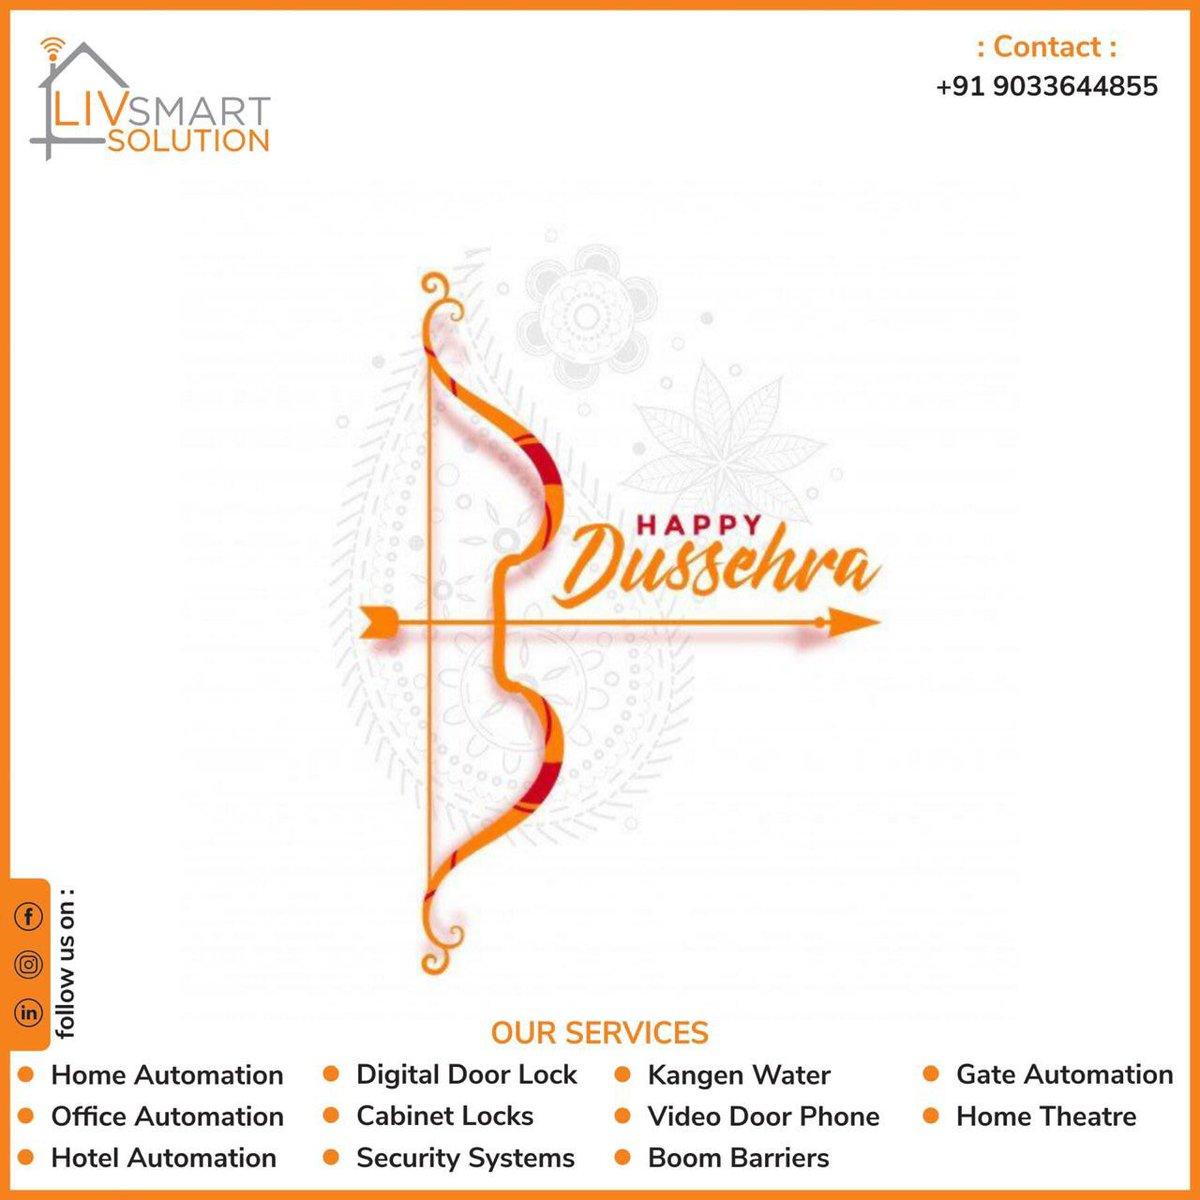 #Dussehra #Homeautomation #Livsmart #TronXthingsAhmedabad #Homesecurity #TronXthings #Epic #doorlock #cabinetlock #officeautomation #alexa #smartron #kangenwater #Ahmedabad #Gandhinagar #sargasan #raisan #gujarat #makeinindia #smarthome #Happynetworking https://t.co/LB7I6hjE0G